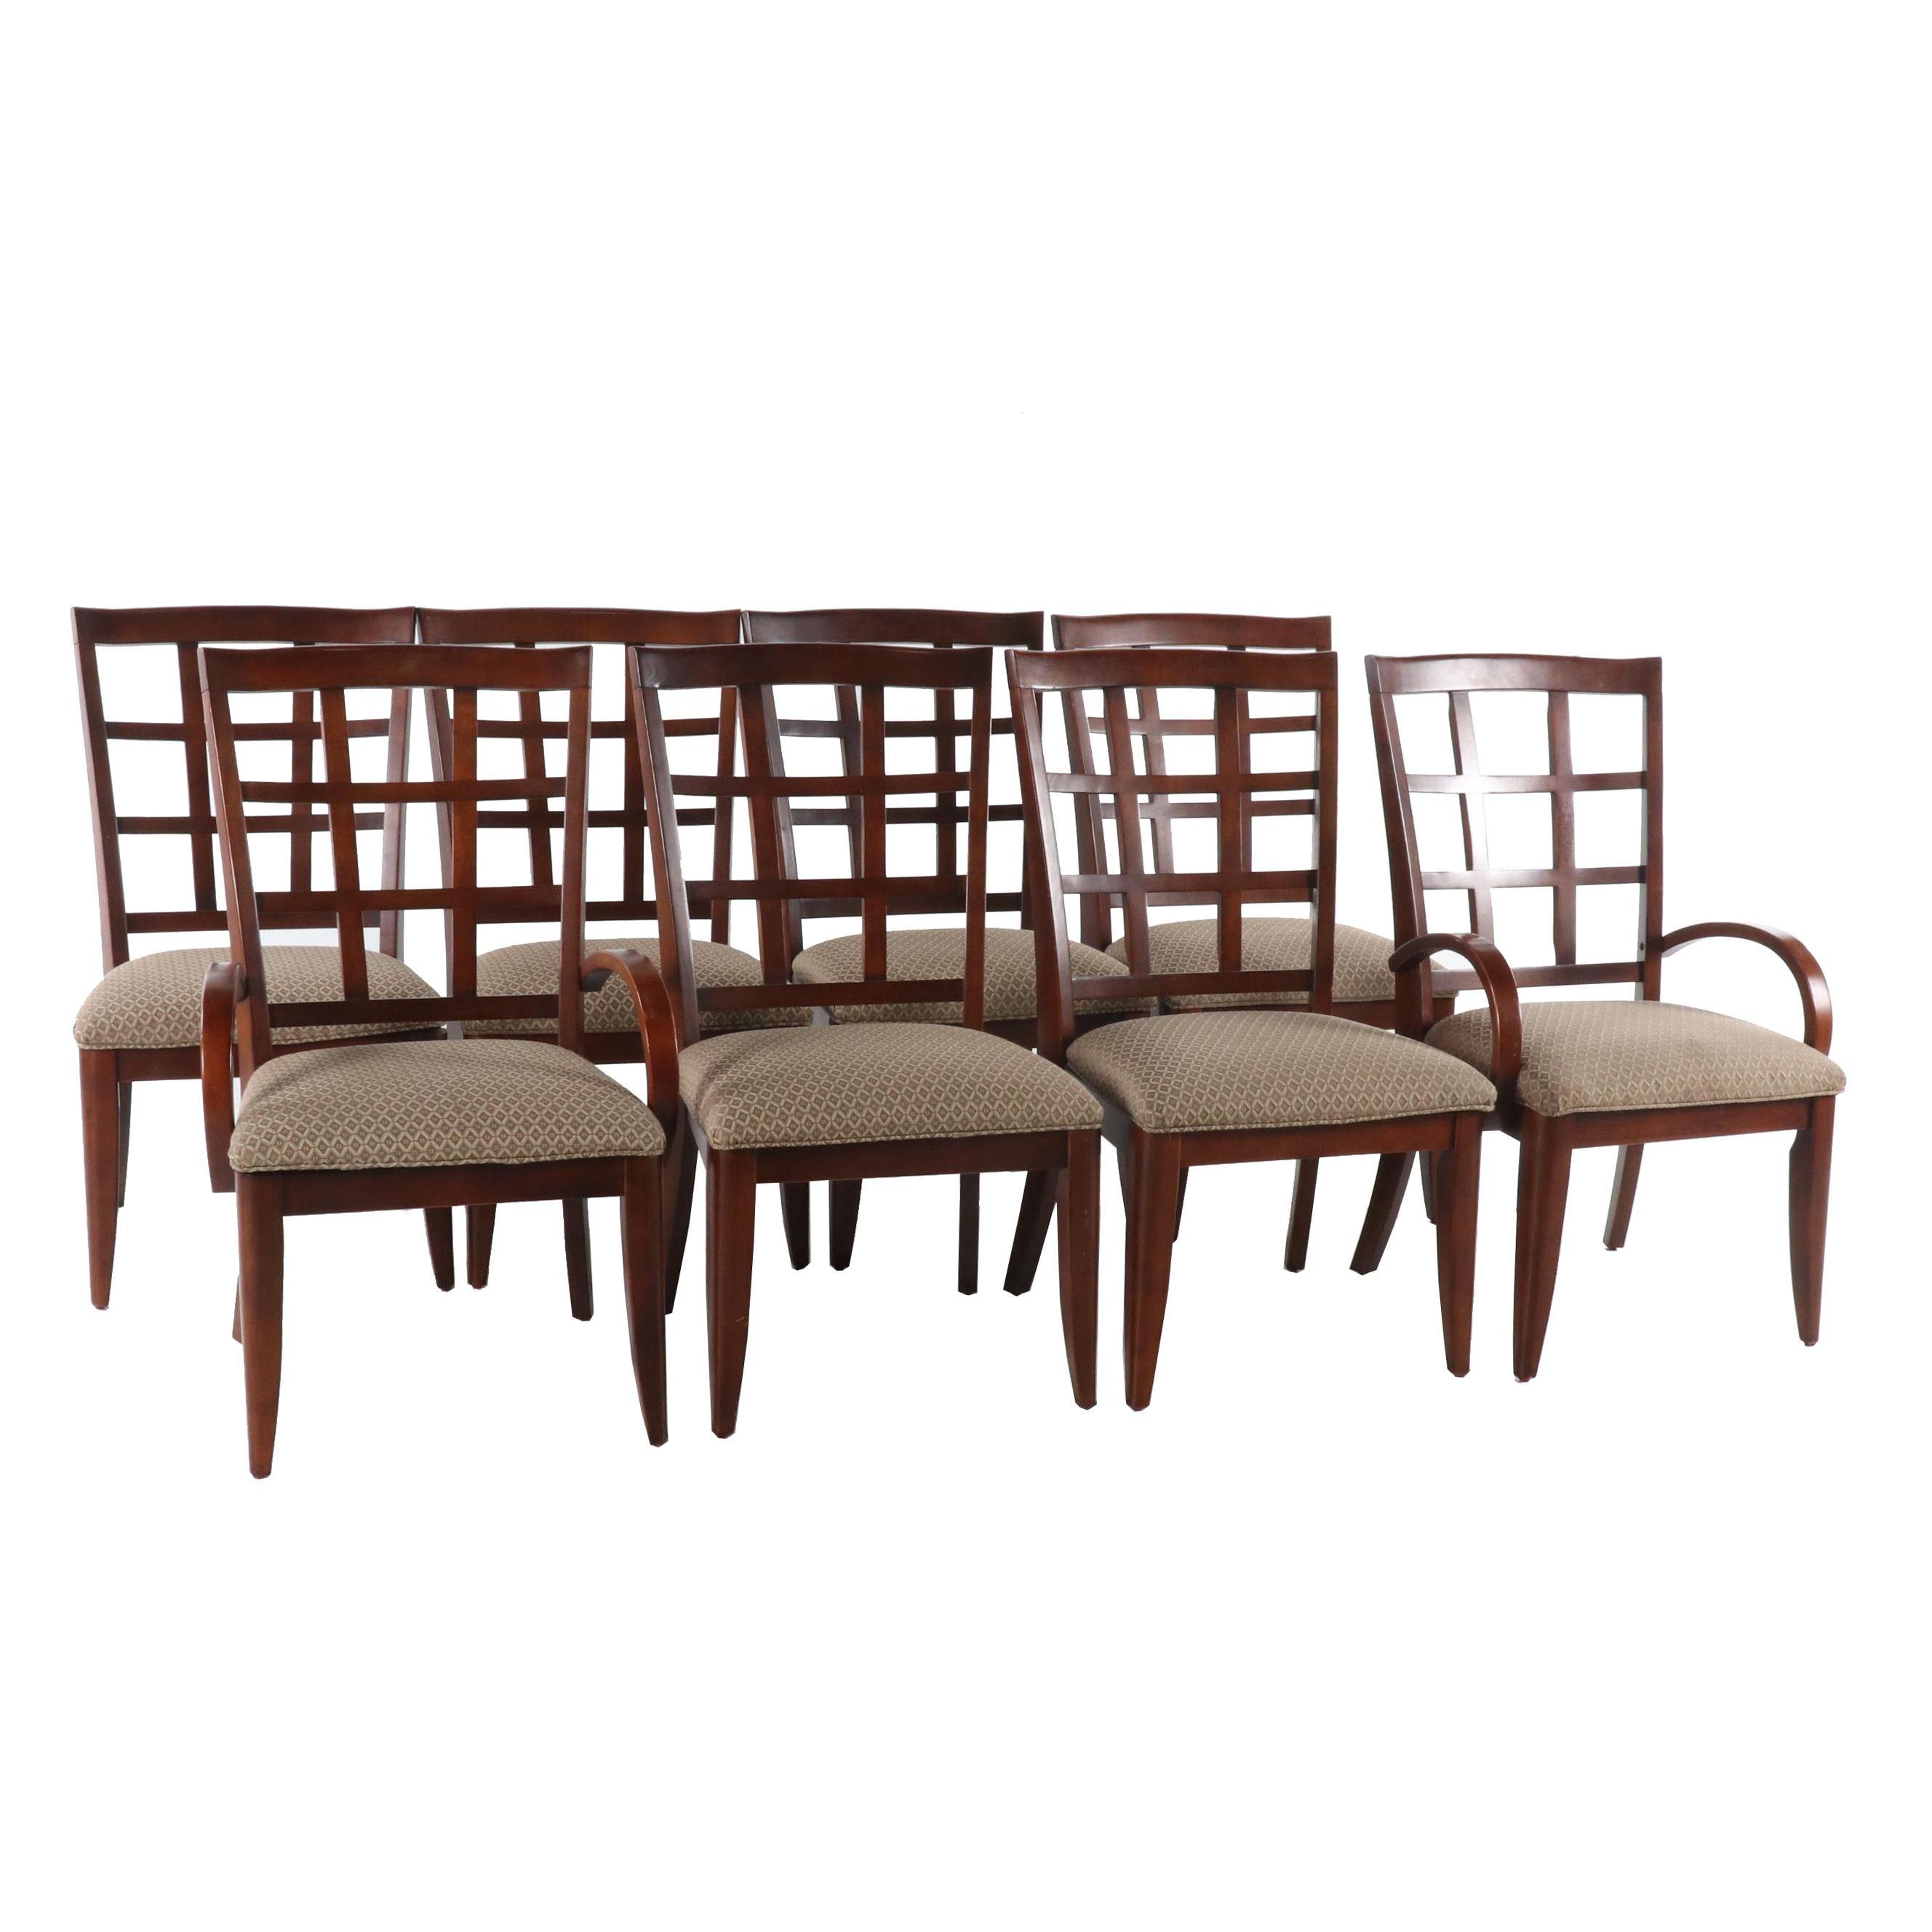 Contemporary Mahogany Finish Wooden Dining Chairs